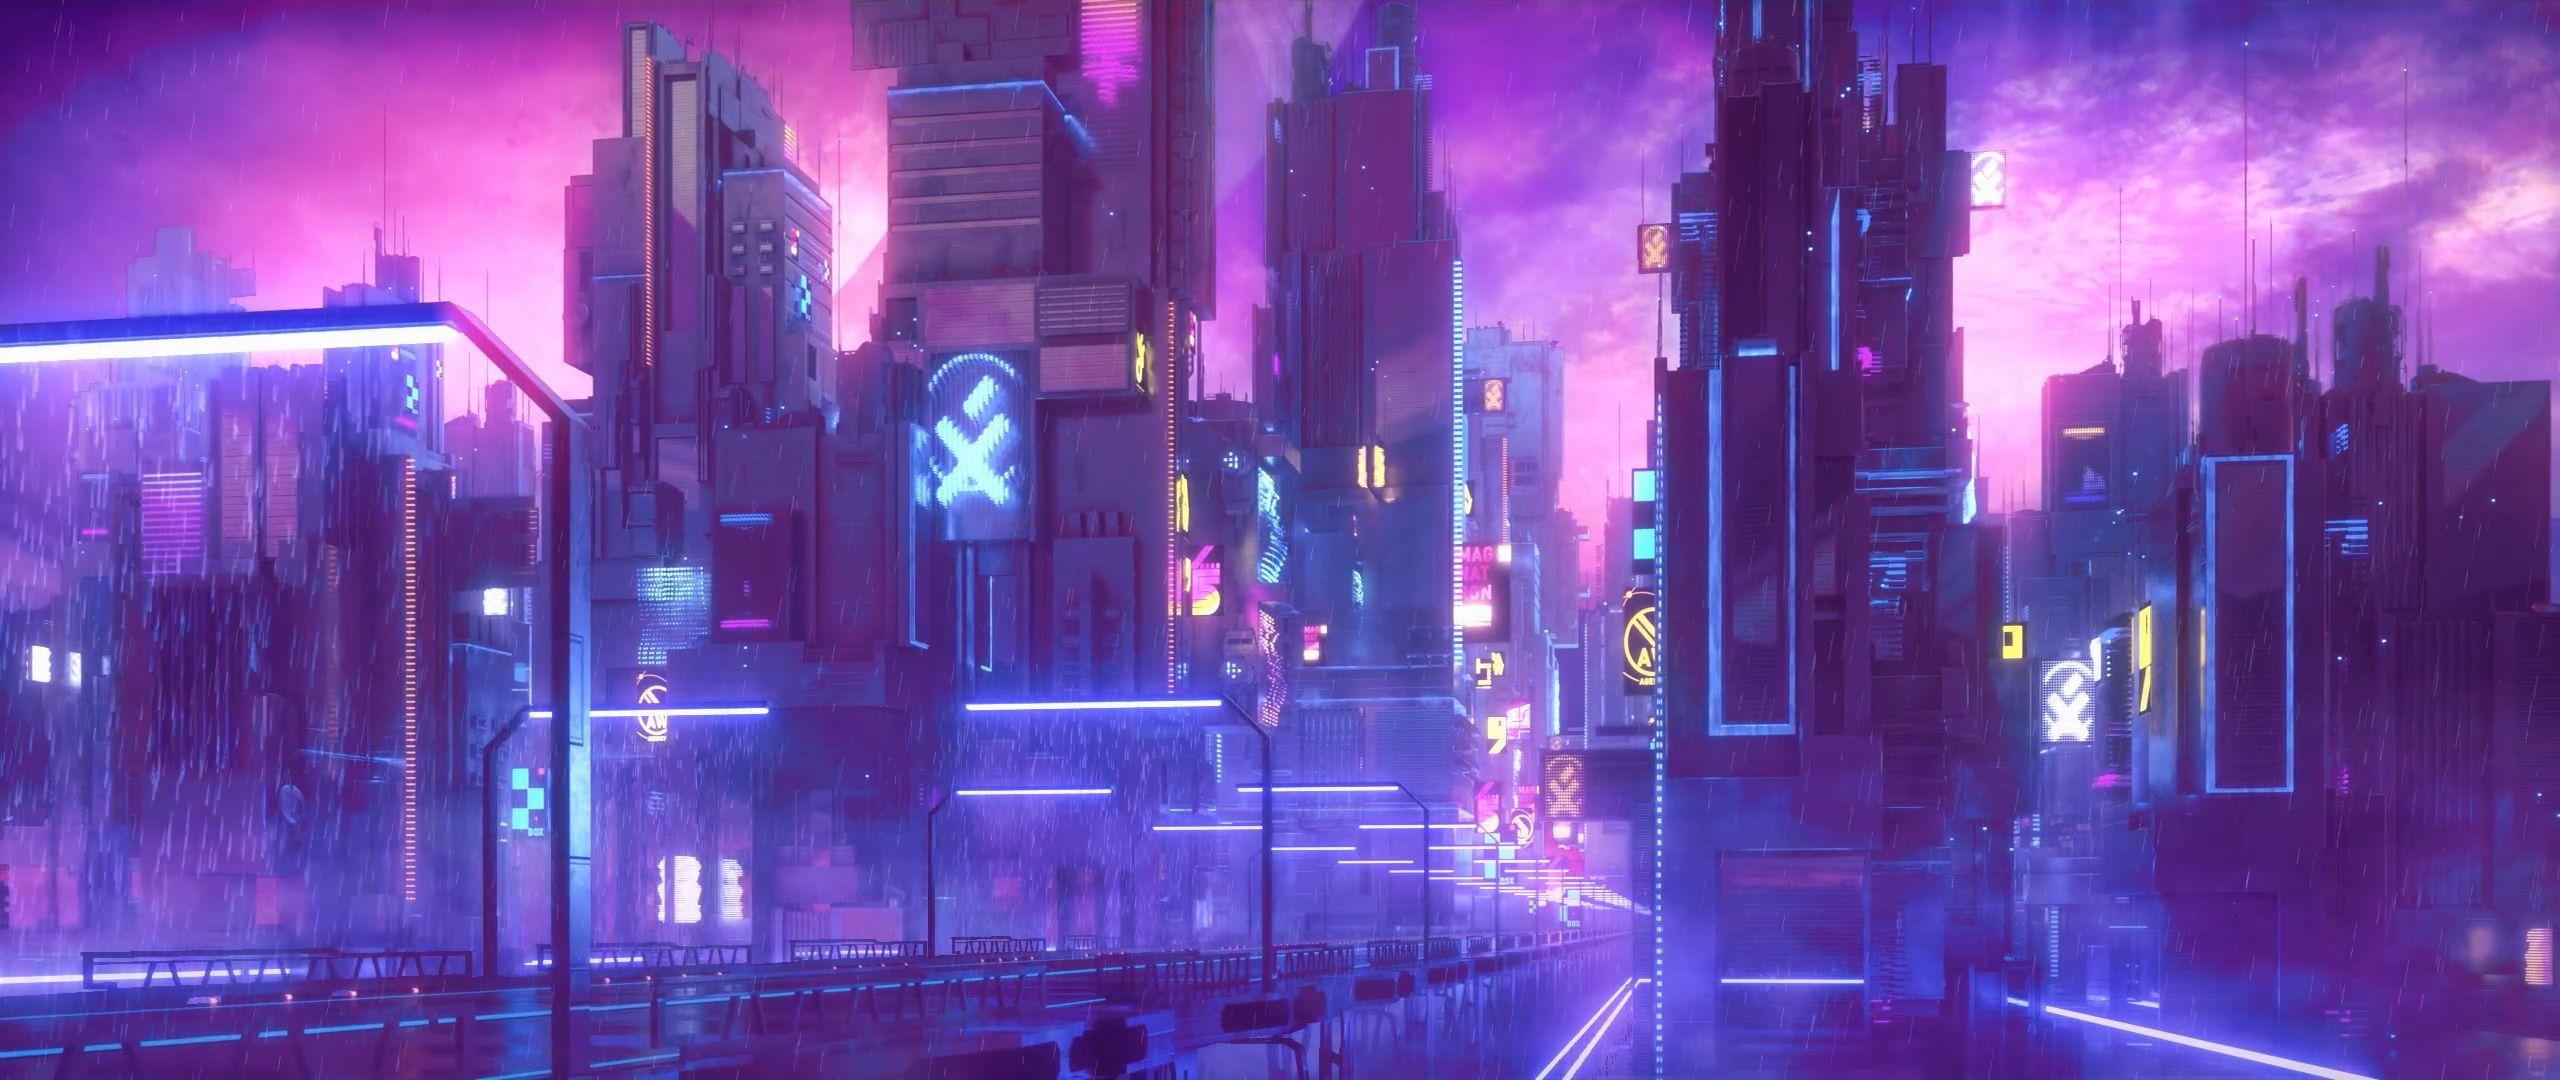 Wallpaper : cyberpunk, neon 2560x1080 - JesseTR - 1197780 ...